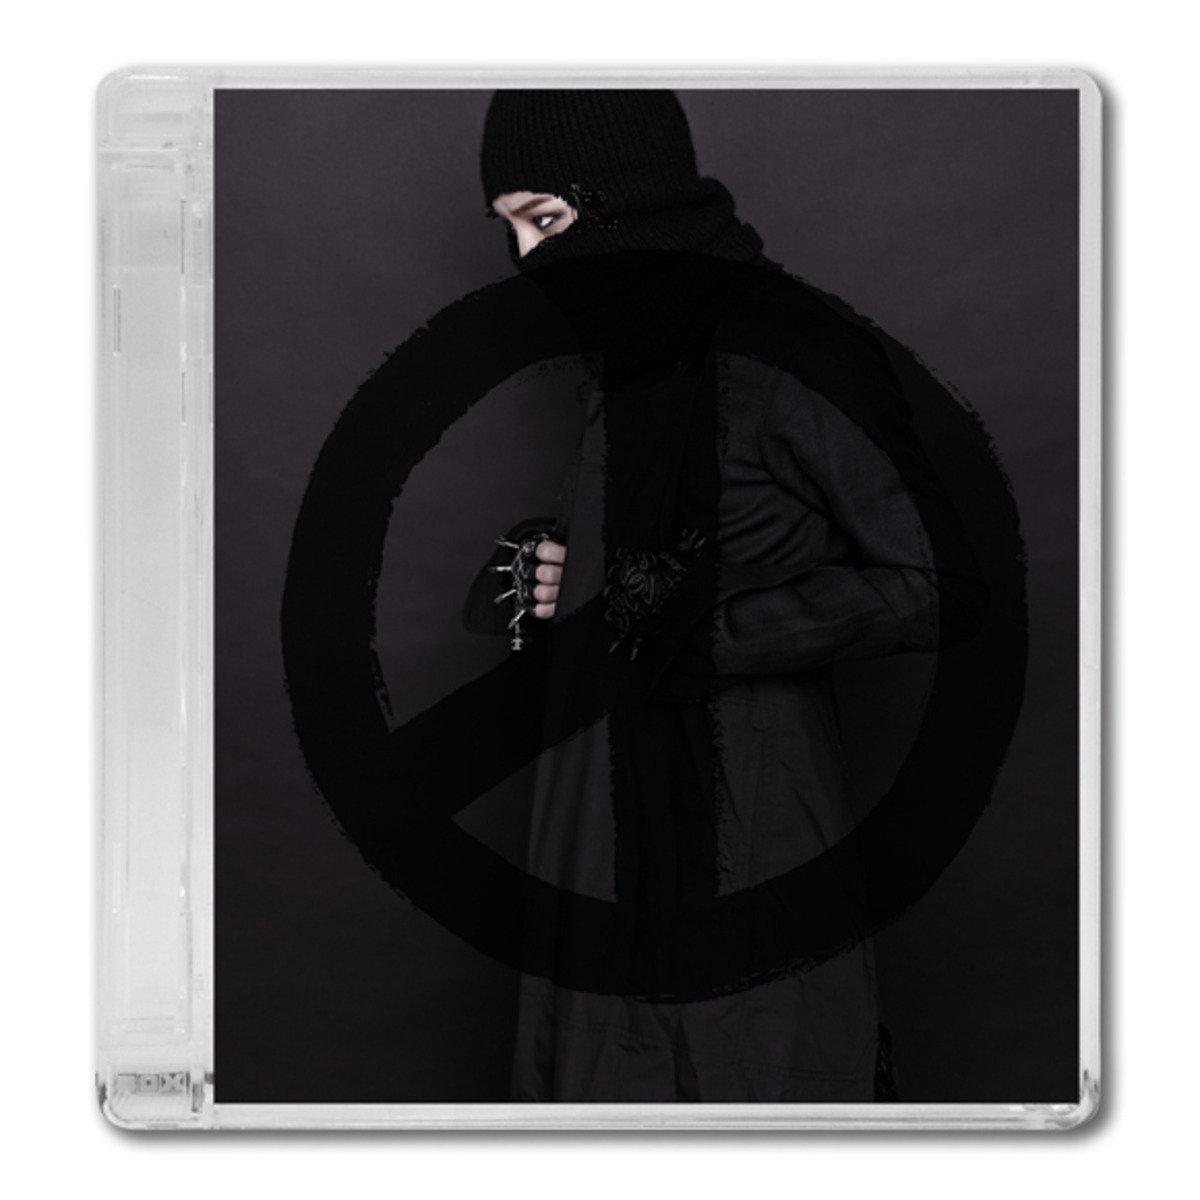 G-Dragon - Vol.2 [COUP D`E TAT] (Black Ver) [+Booklet+SPACE8 Ticket]+Photocard(1p)_8809269502353